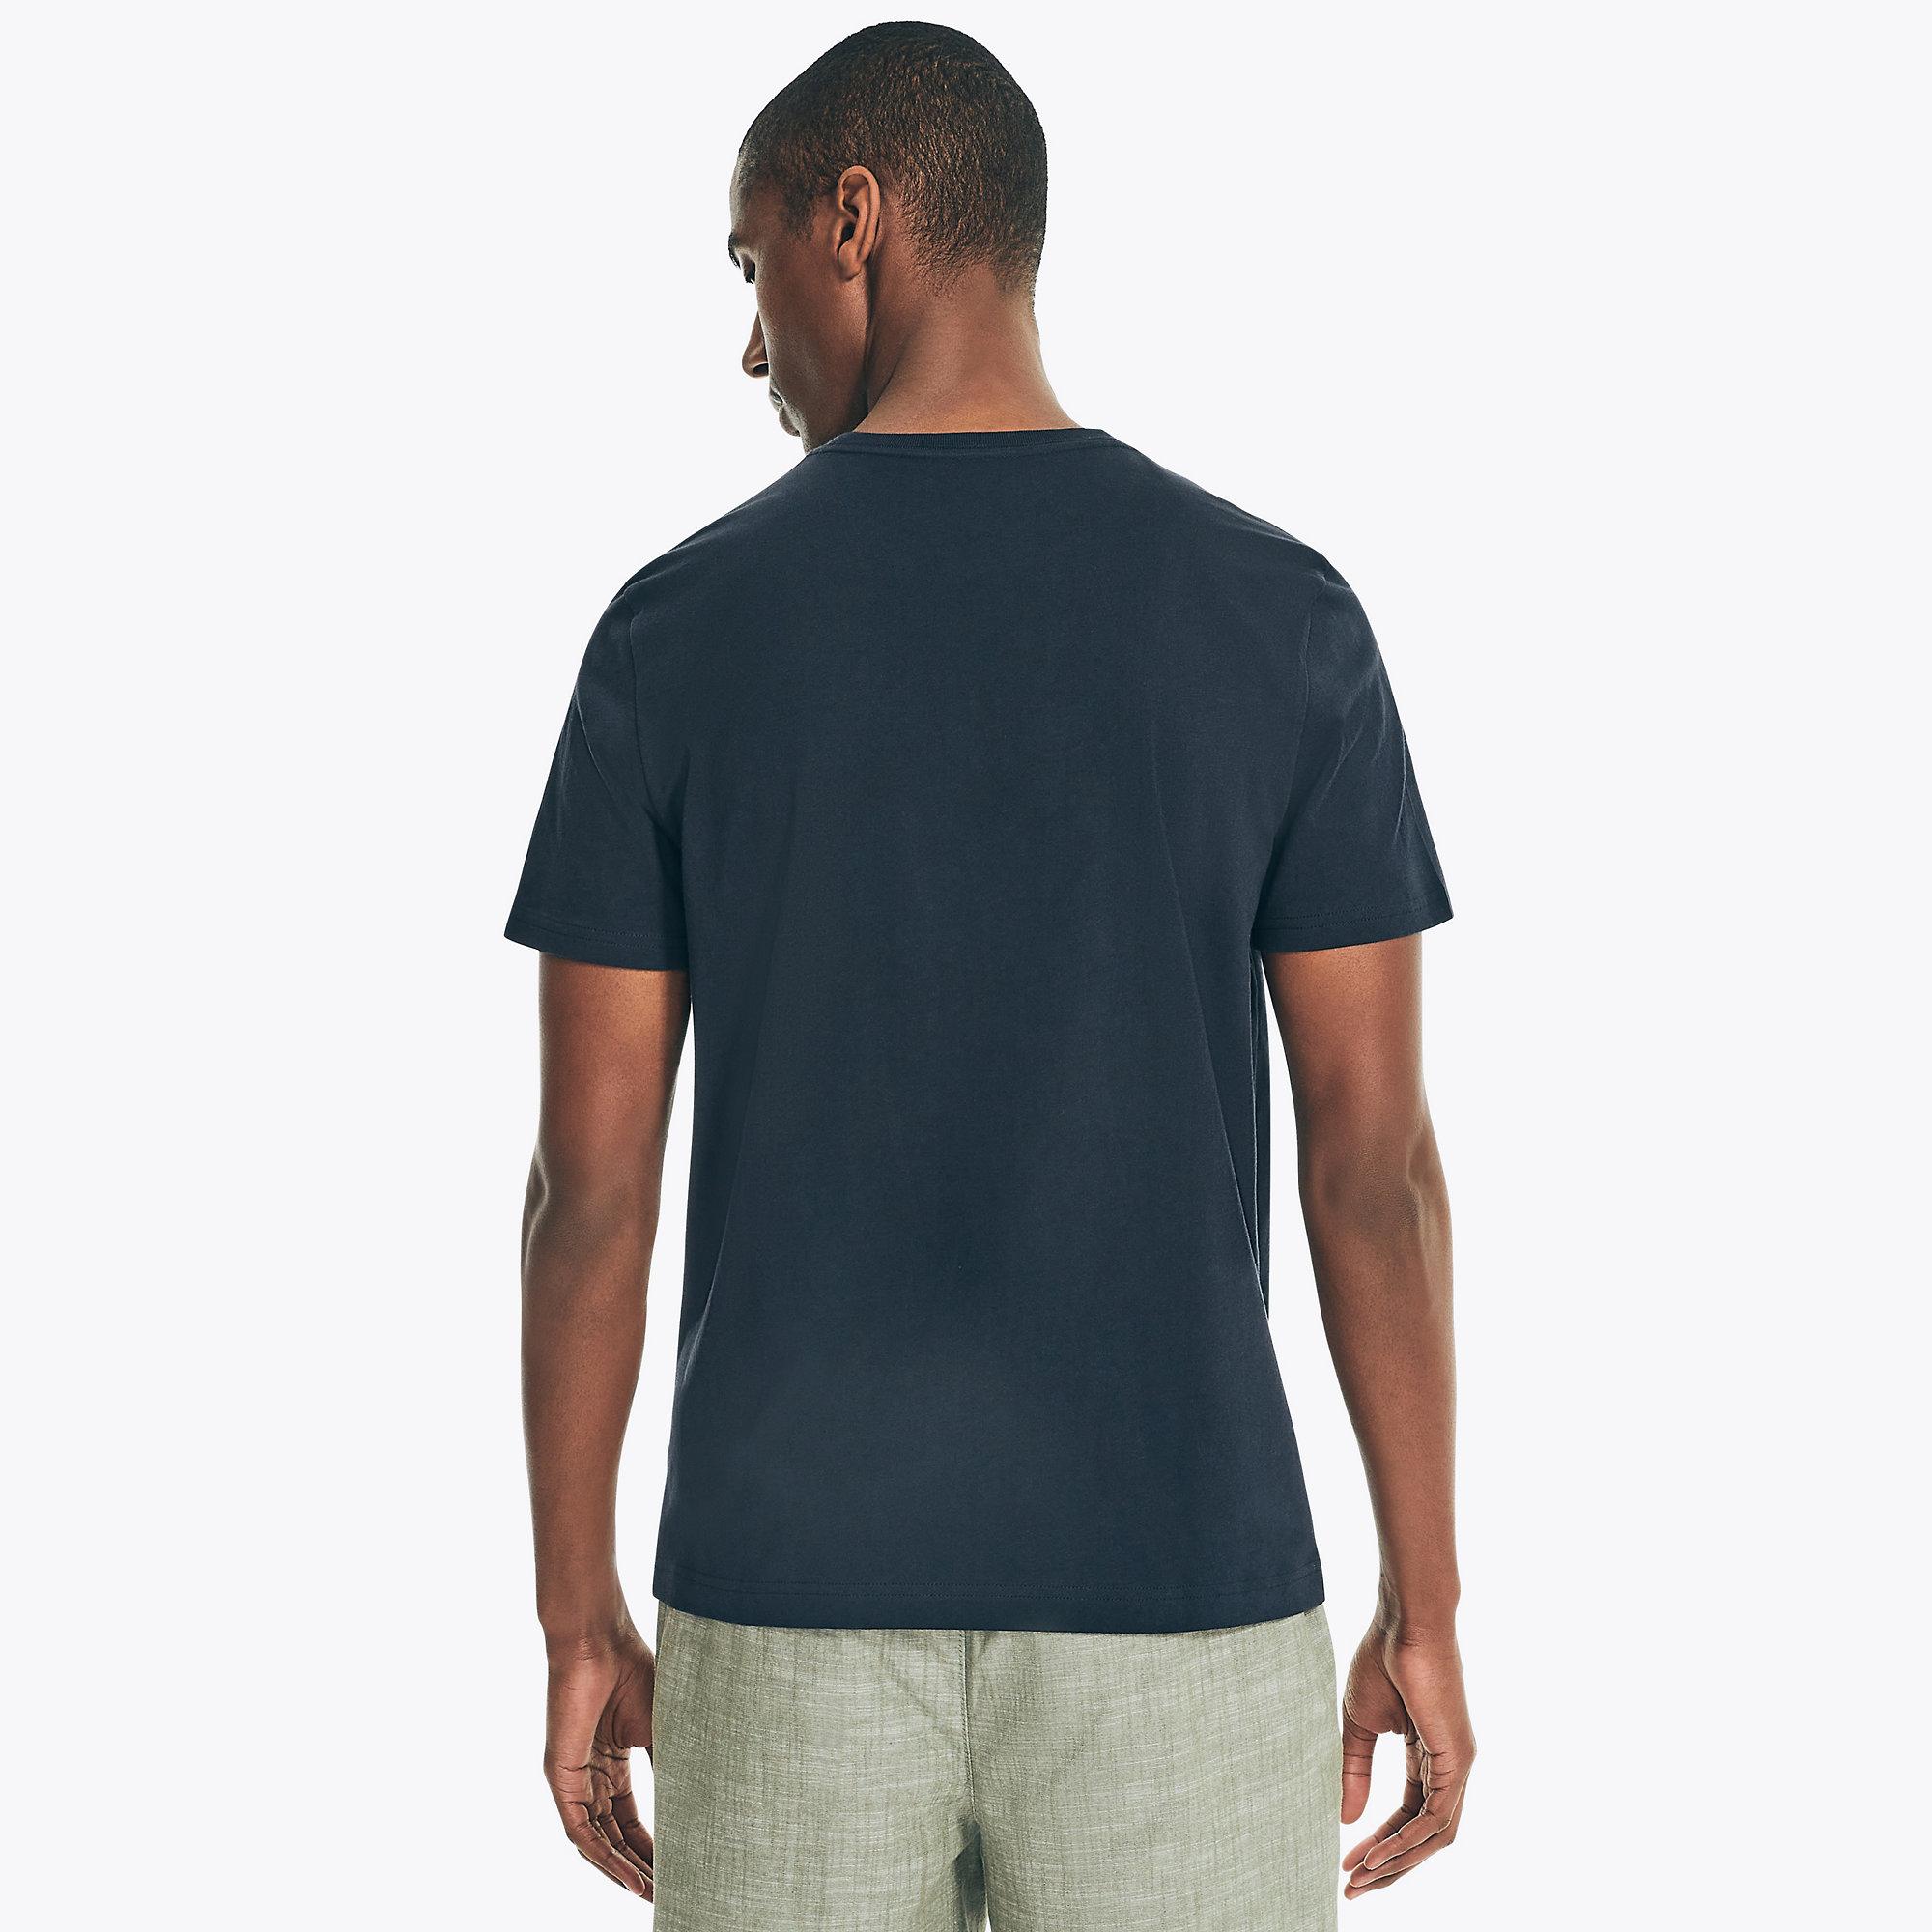 Nautica-Mens-Solid-Short-Sleeve-Crewneck-T-Shirt thumbnail 2